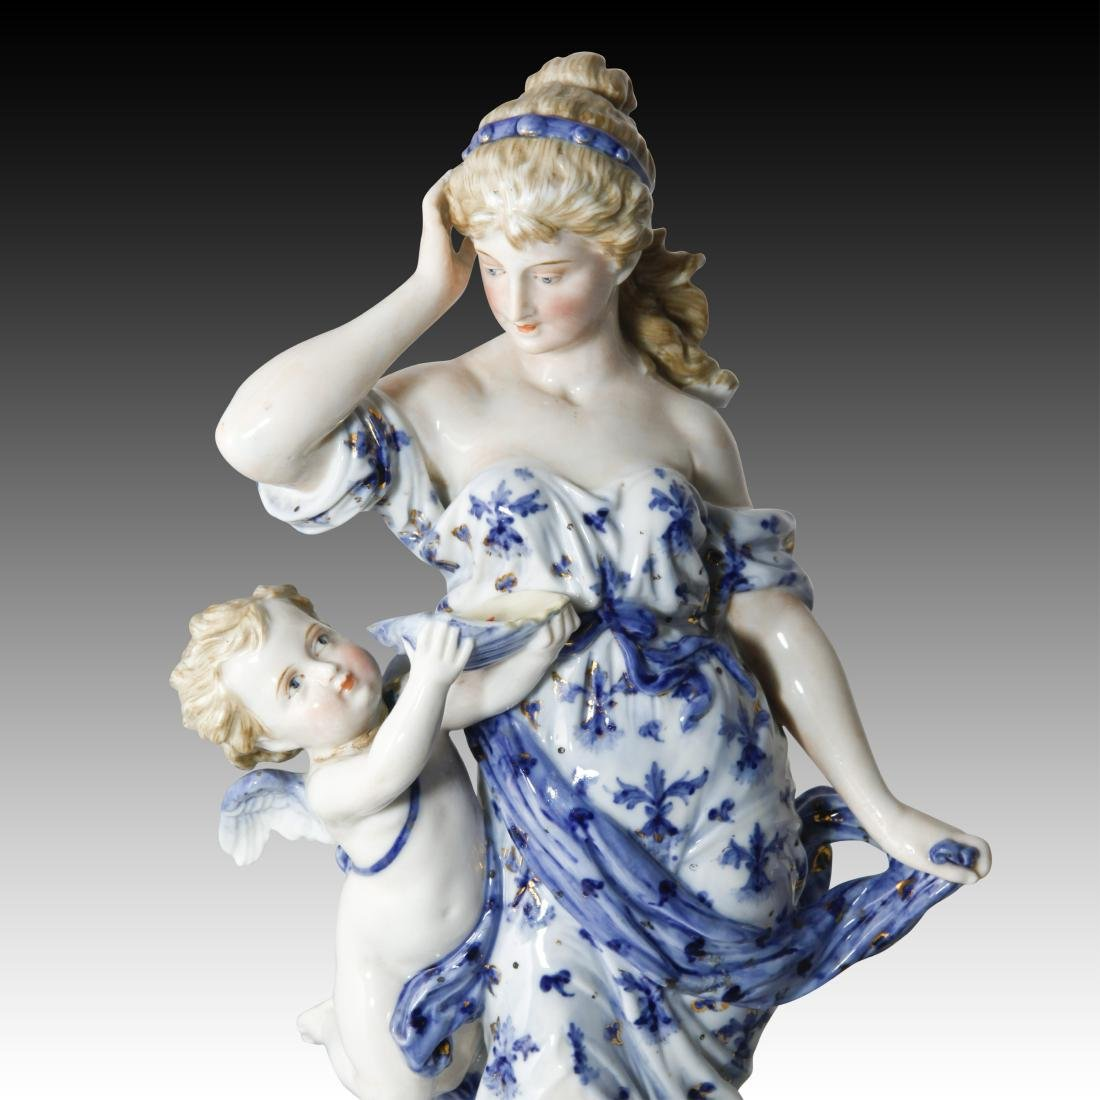 KPM Rubenesque Woman with Cherub Figurine 1049 - 2